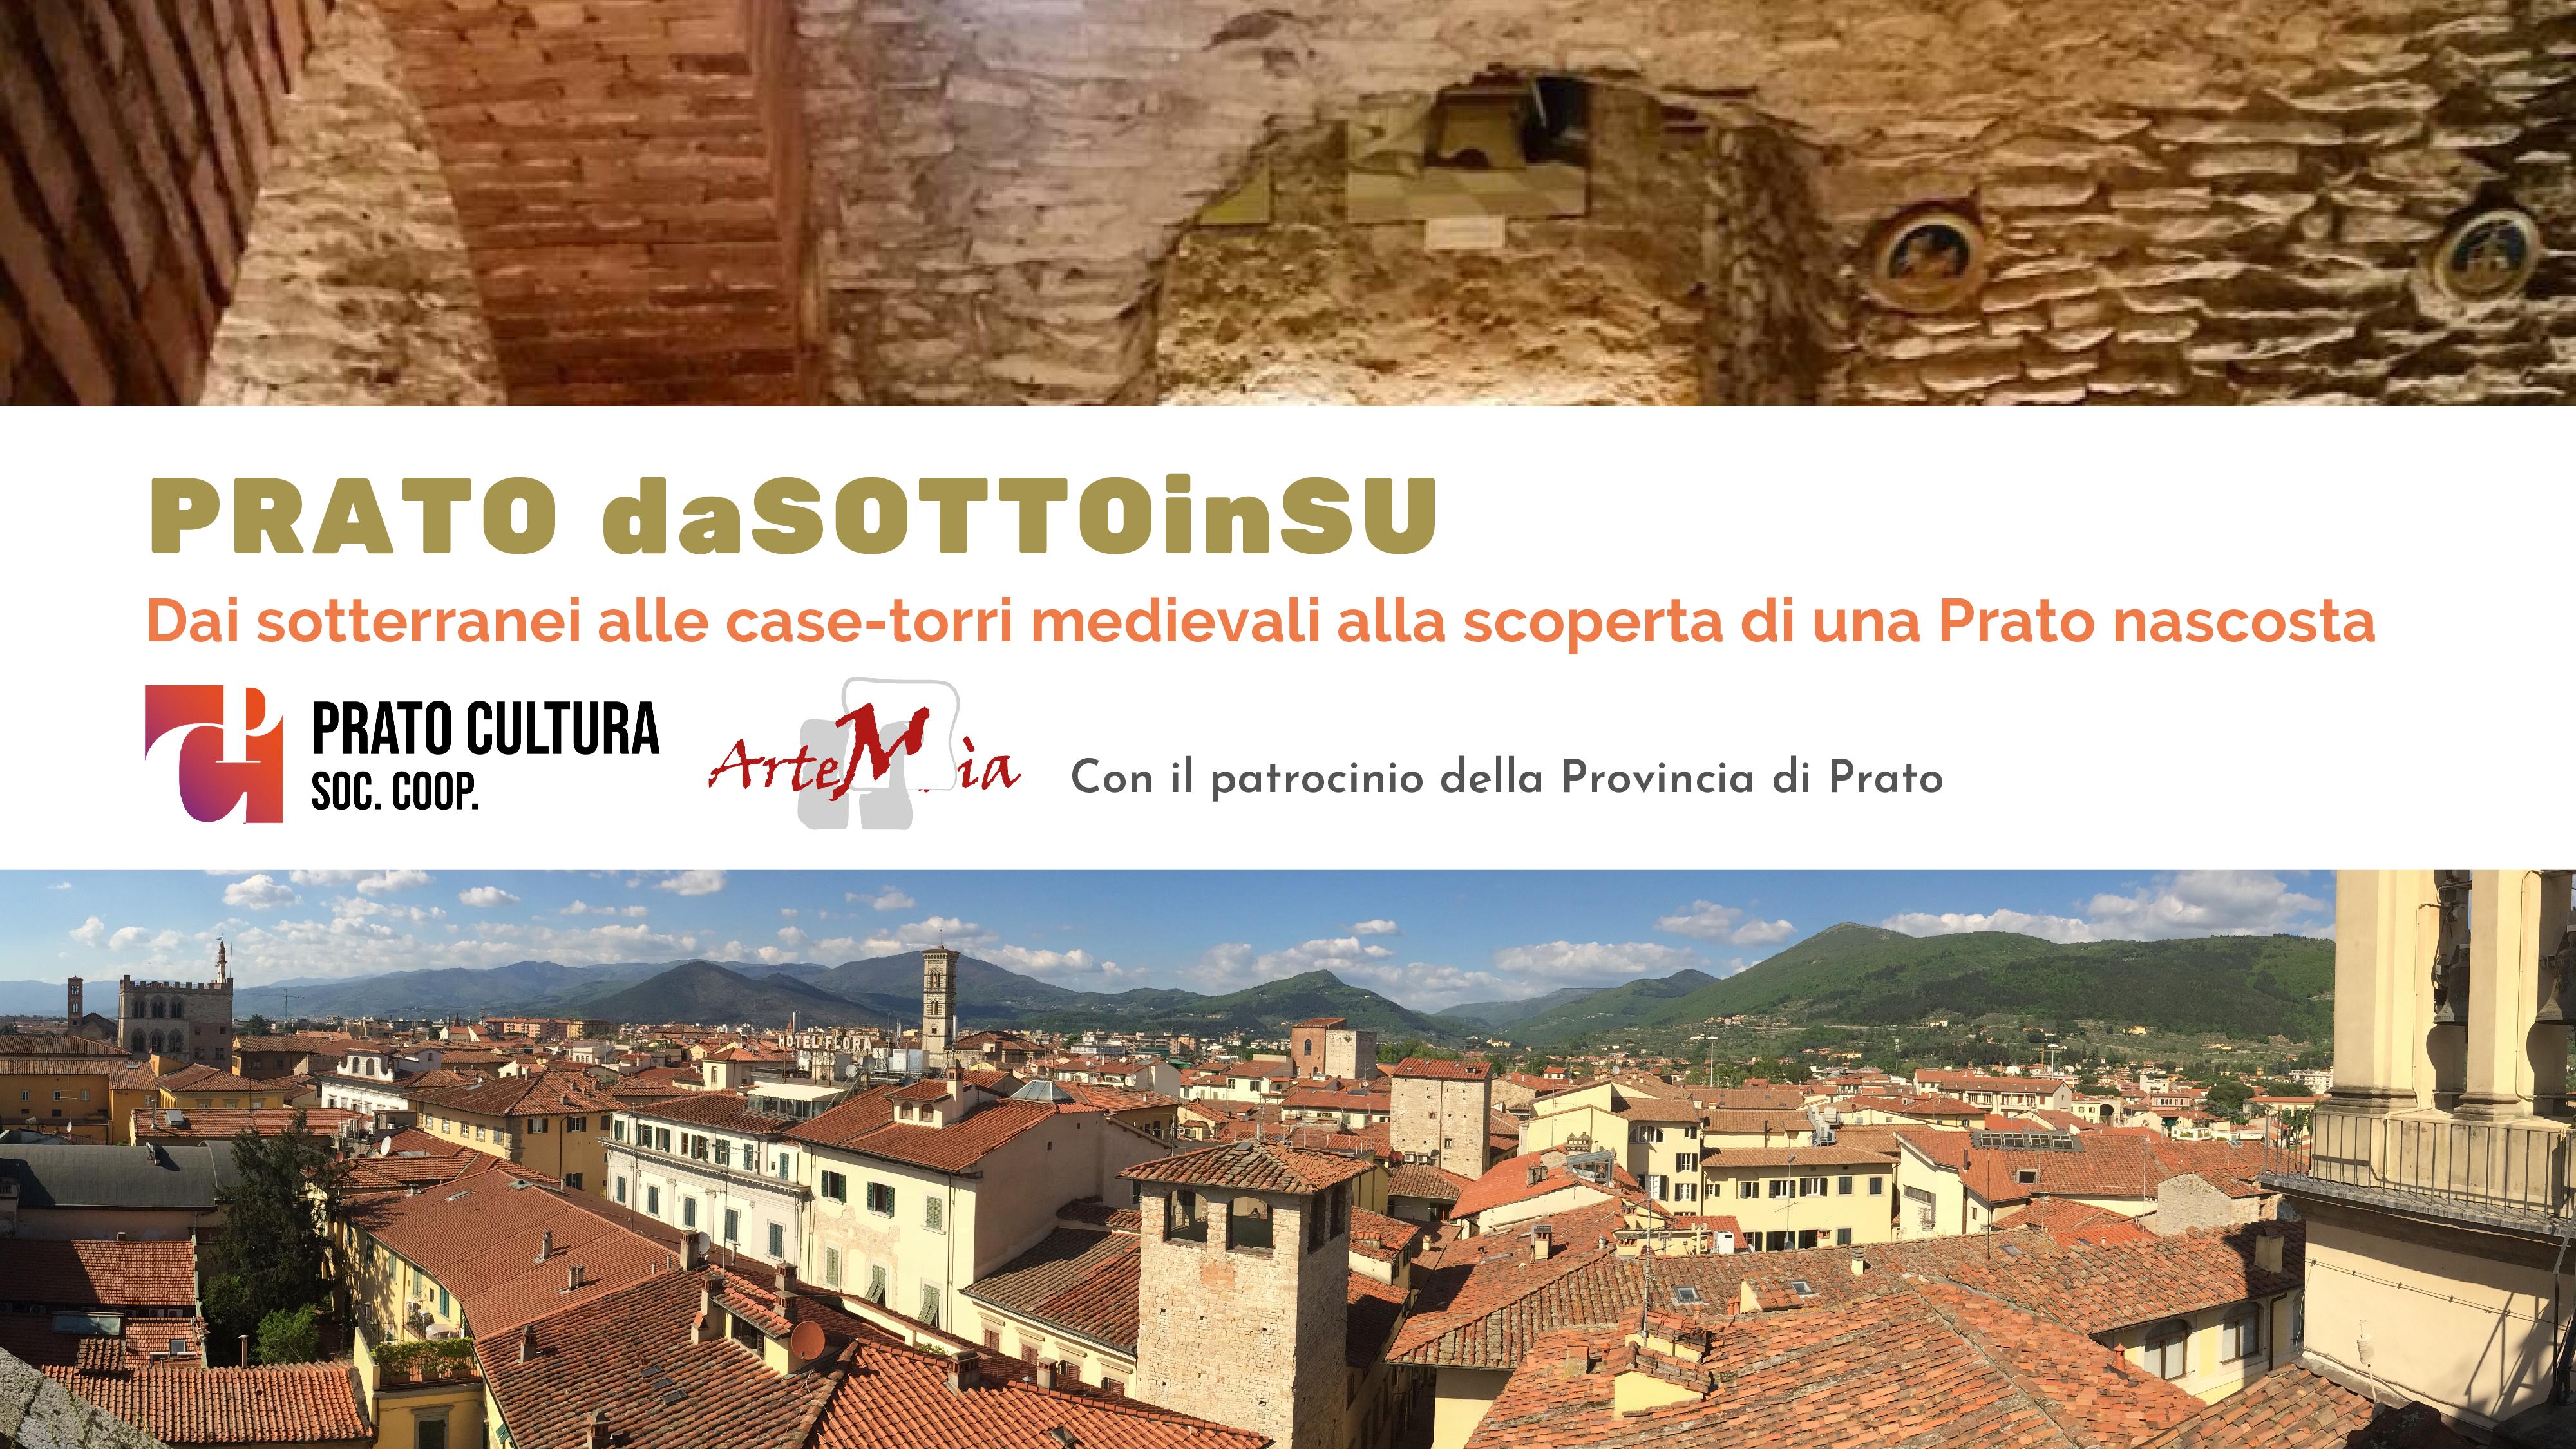 Visita: PRATO daSOTTOinSU: DAI SOTTERRANEI ALLE CASE-TORRI MEDIEVALI!